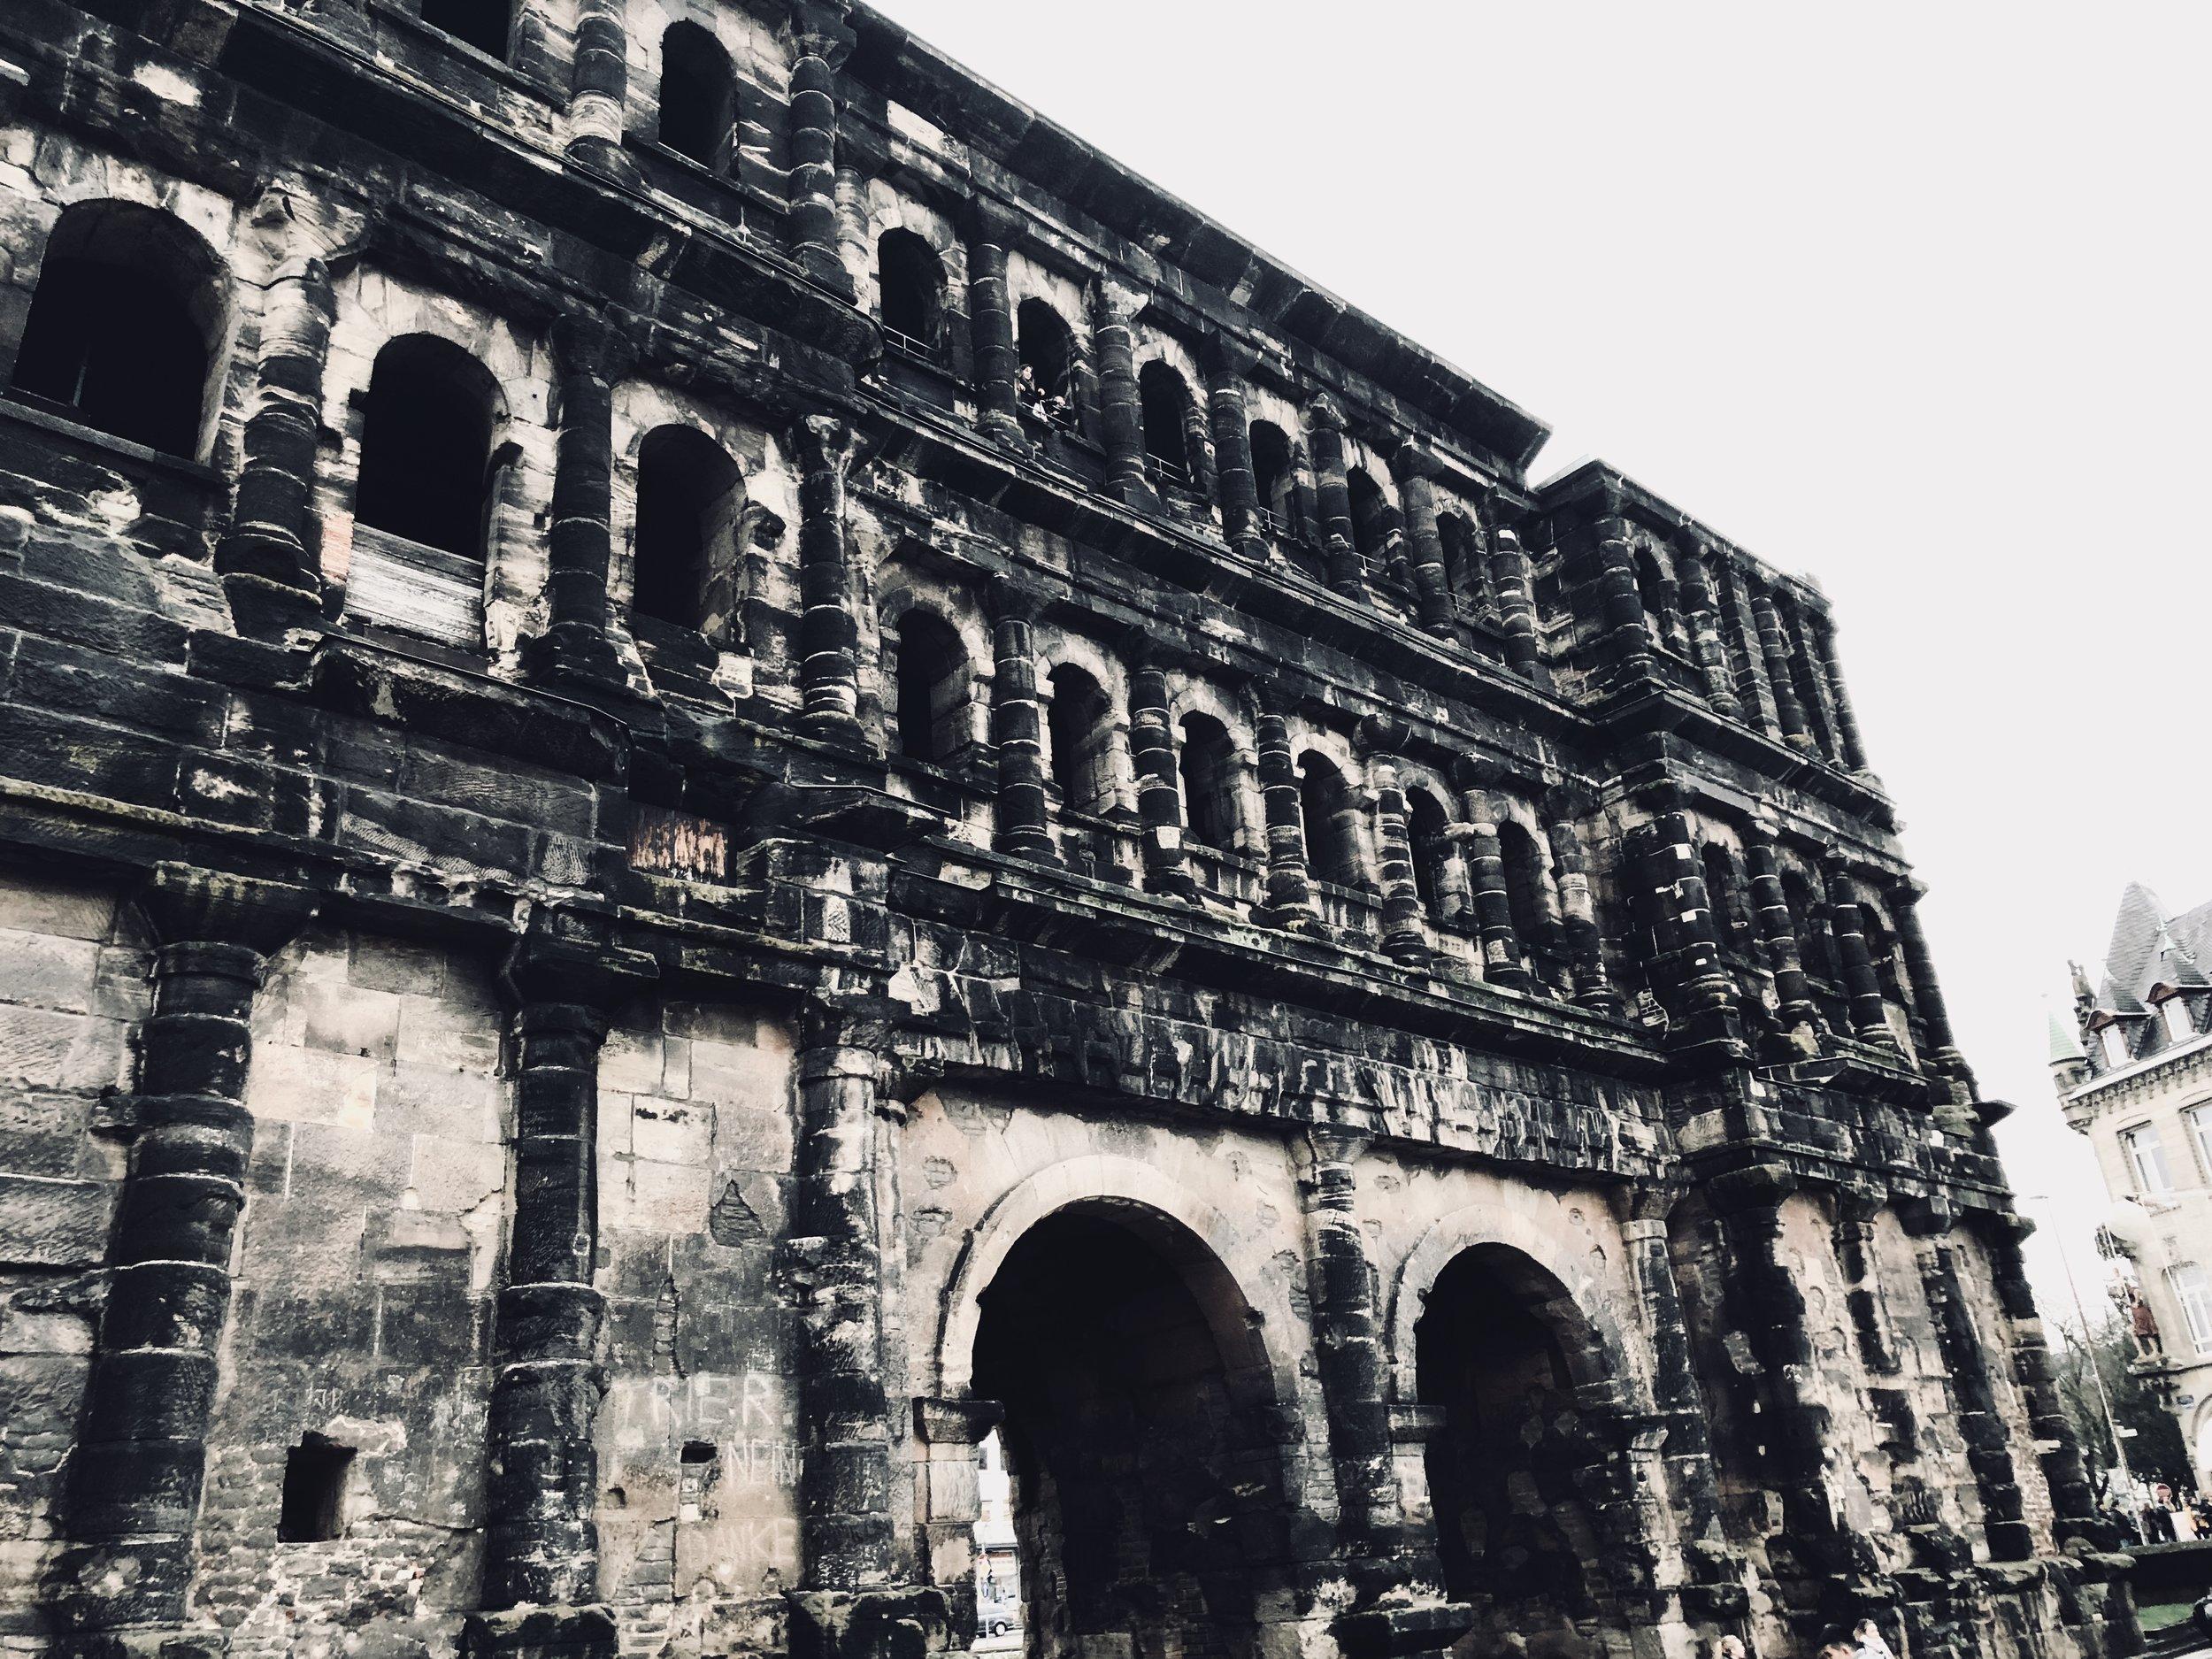 Porta negra, Trier. Roman entrance gate to the old city.